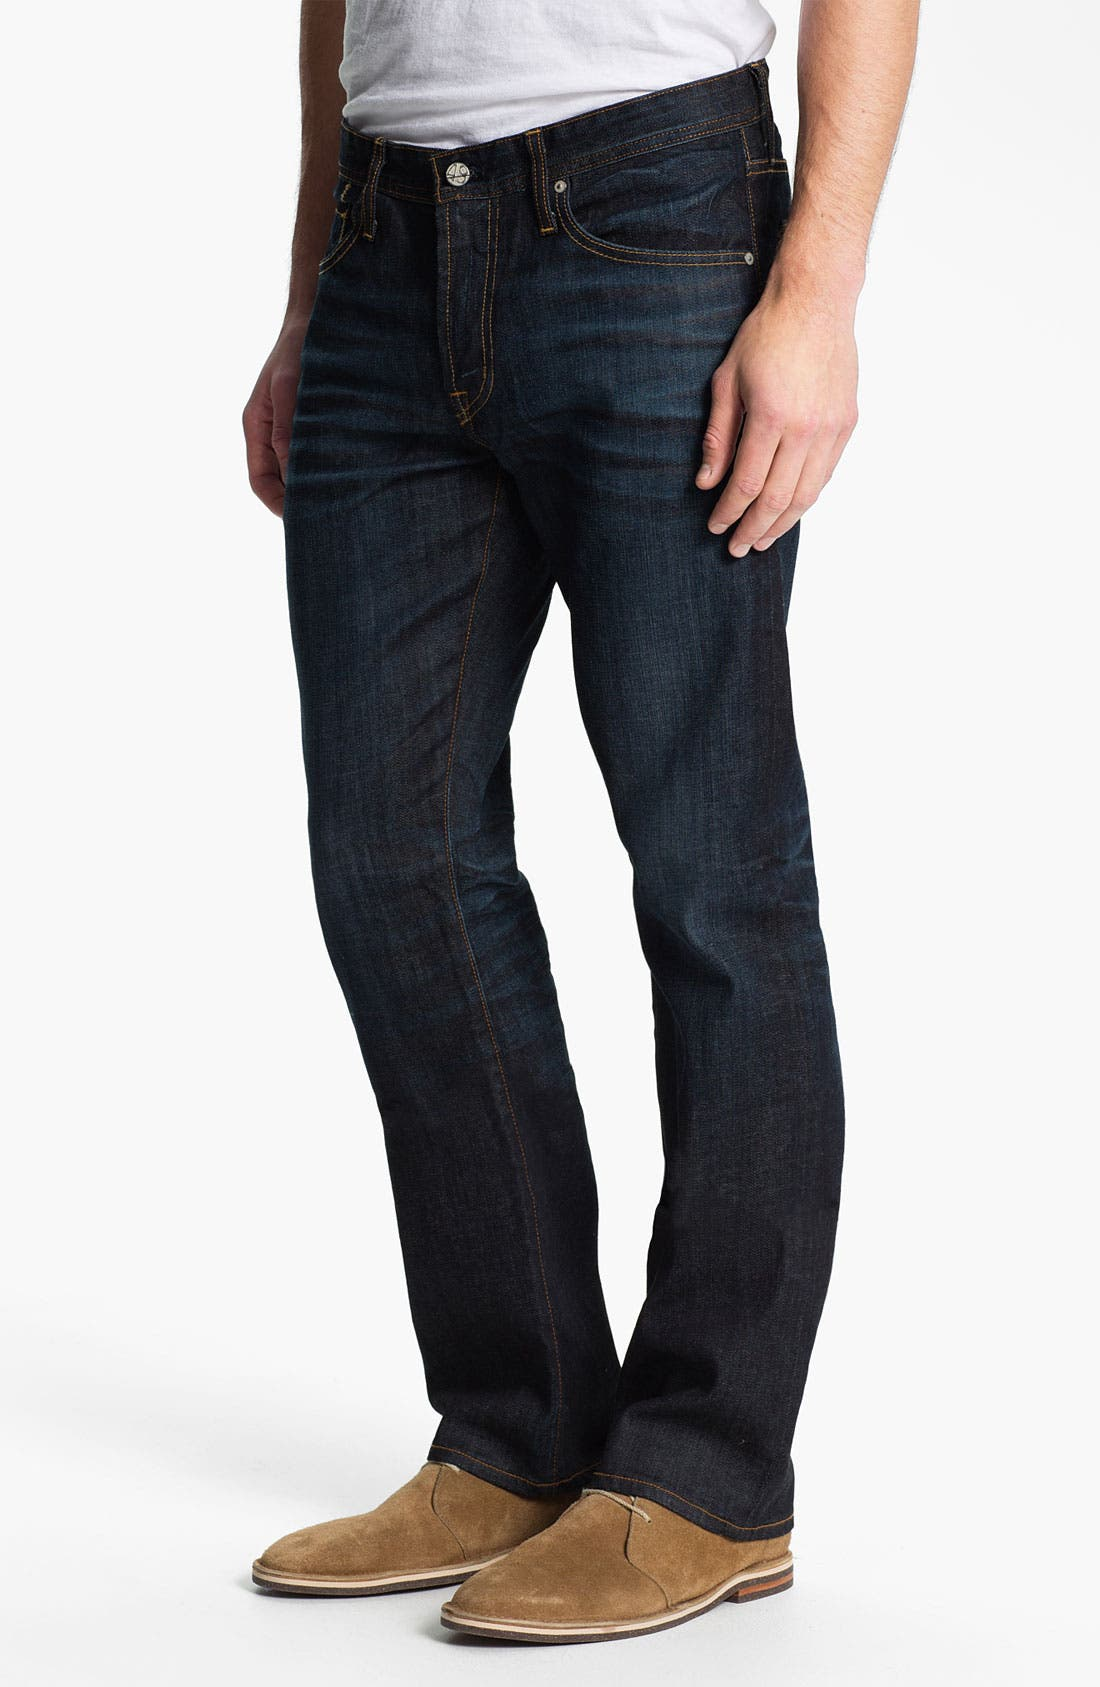 Alternate Image 1 Selected - AG Jeans 'Protégé' Straight Leg Jeans (Two Year Dusk)